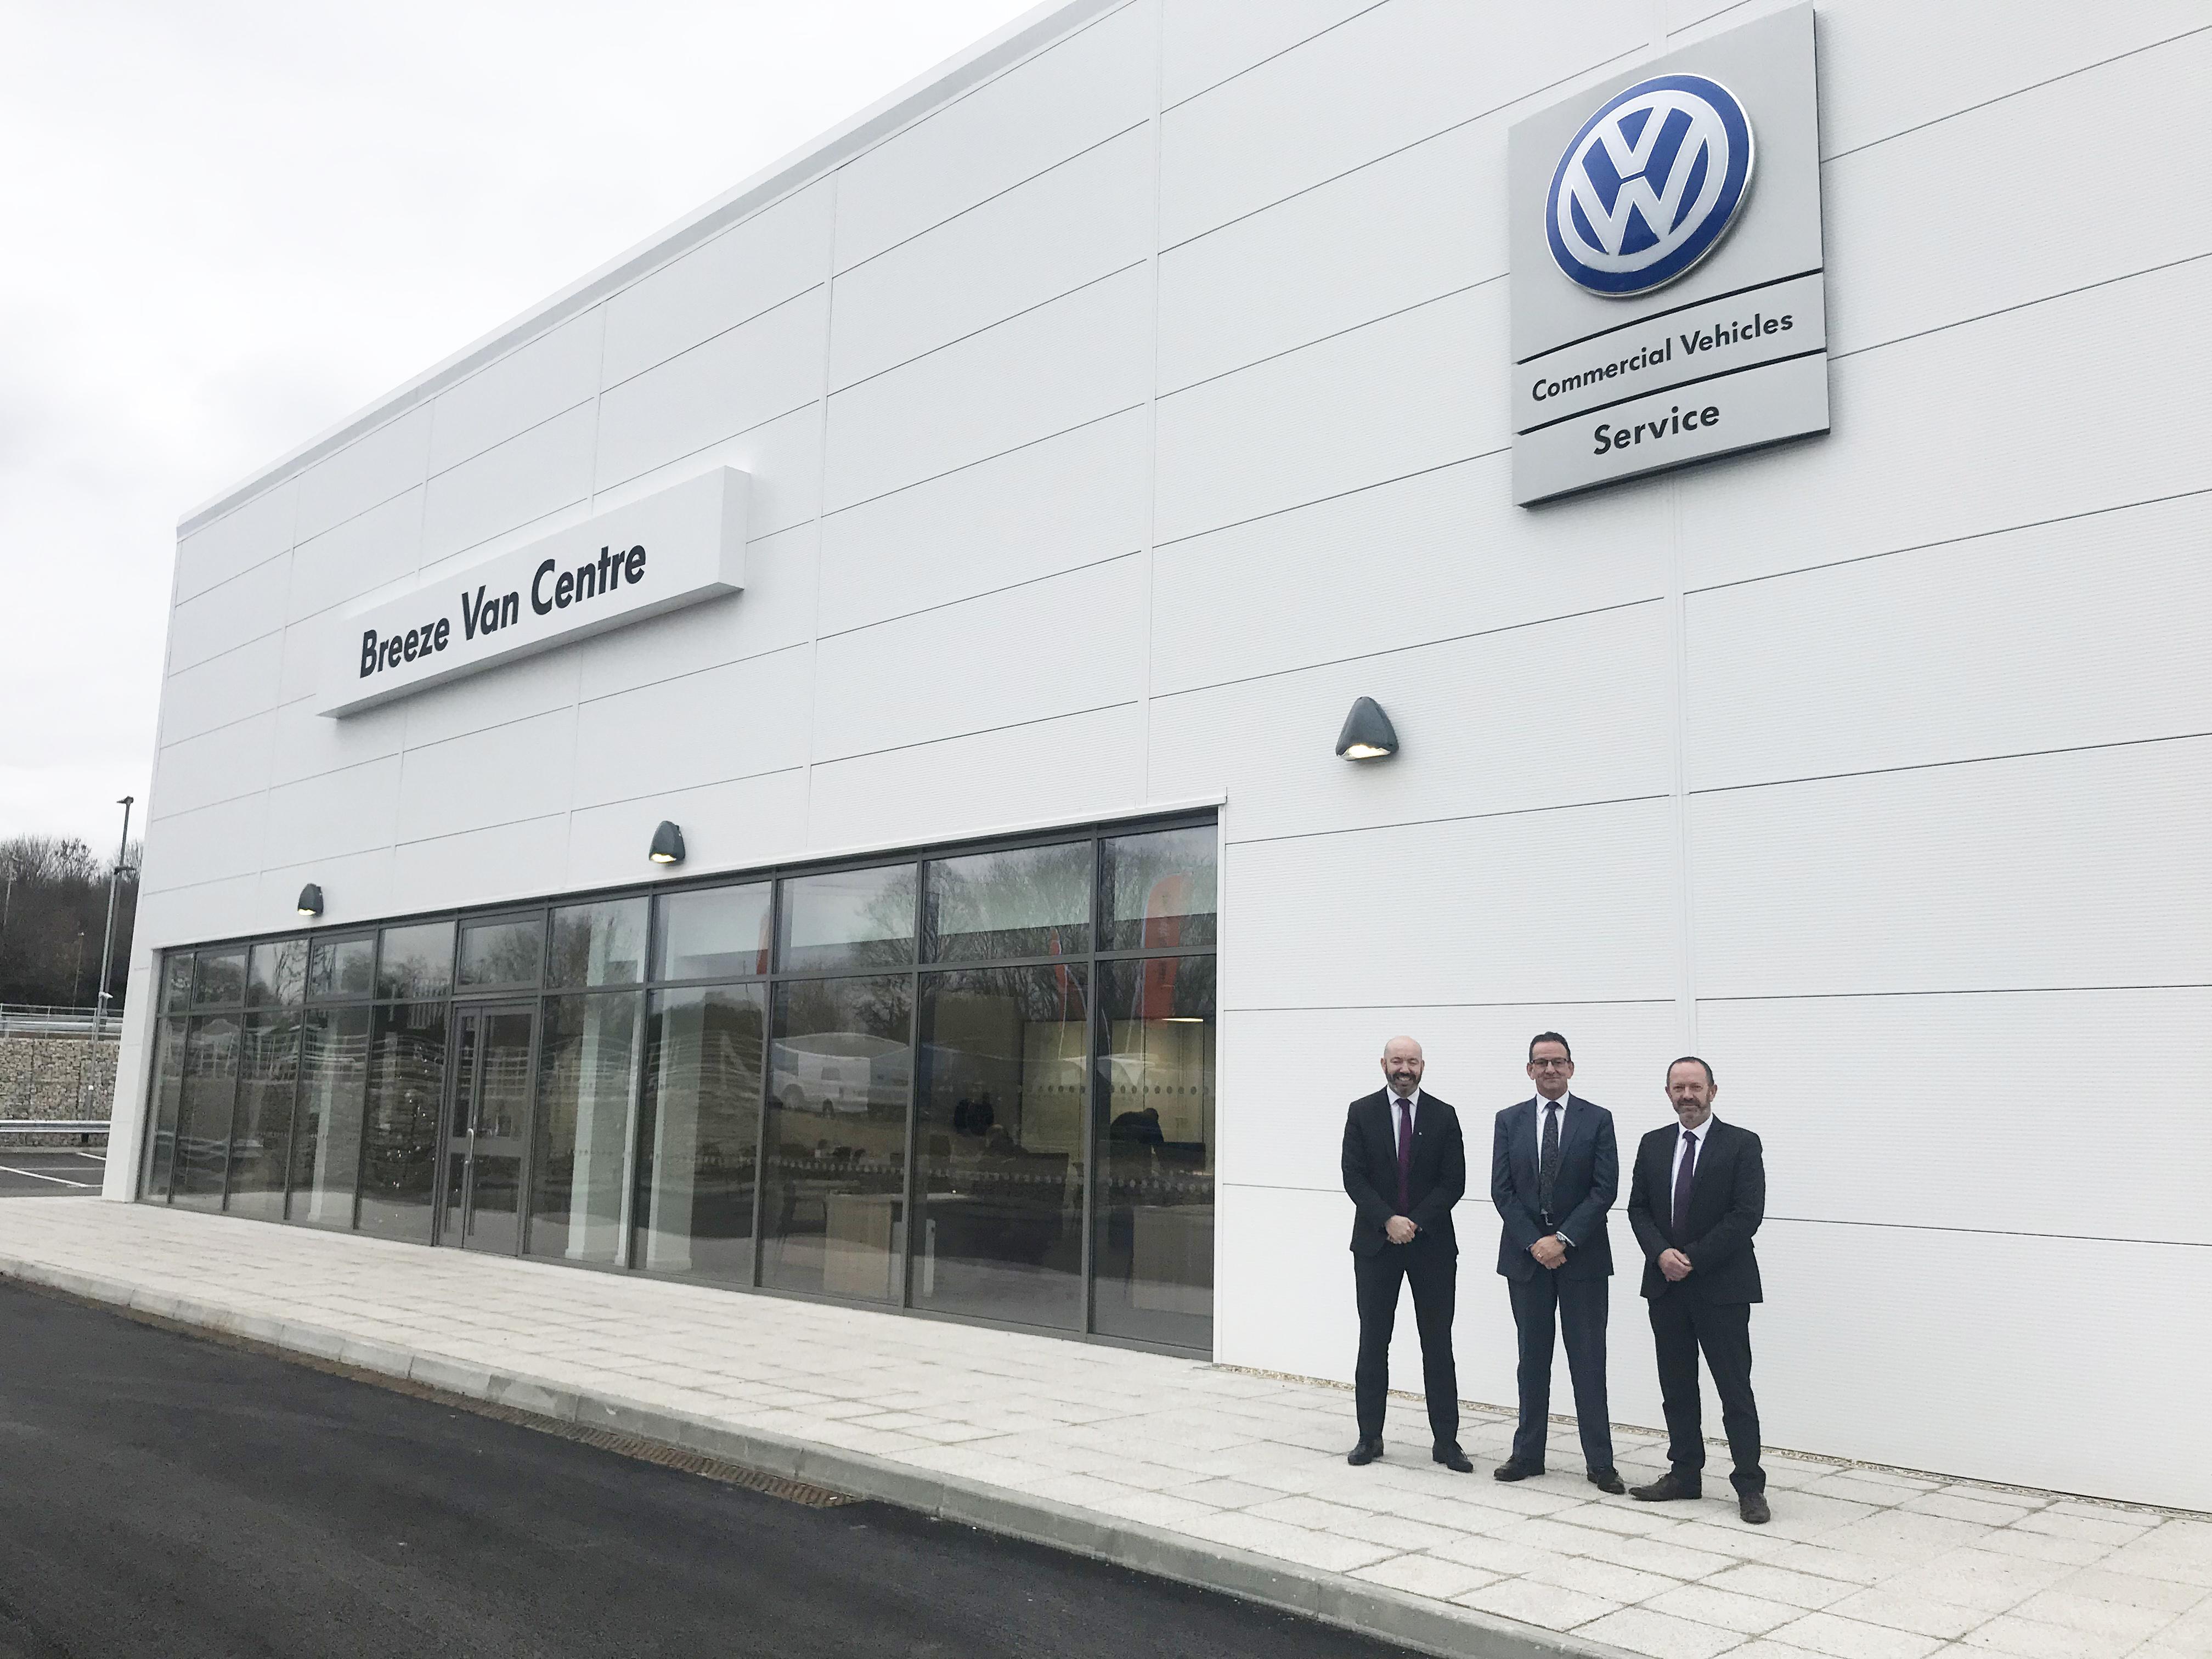 823bc64988 New Volkswagen Commercial Vehicles outlet makes van maintenance a  Breeze   - Car Dealer Magazine